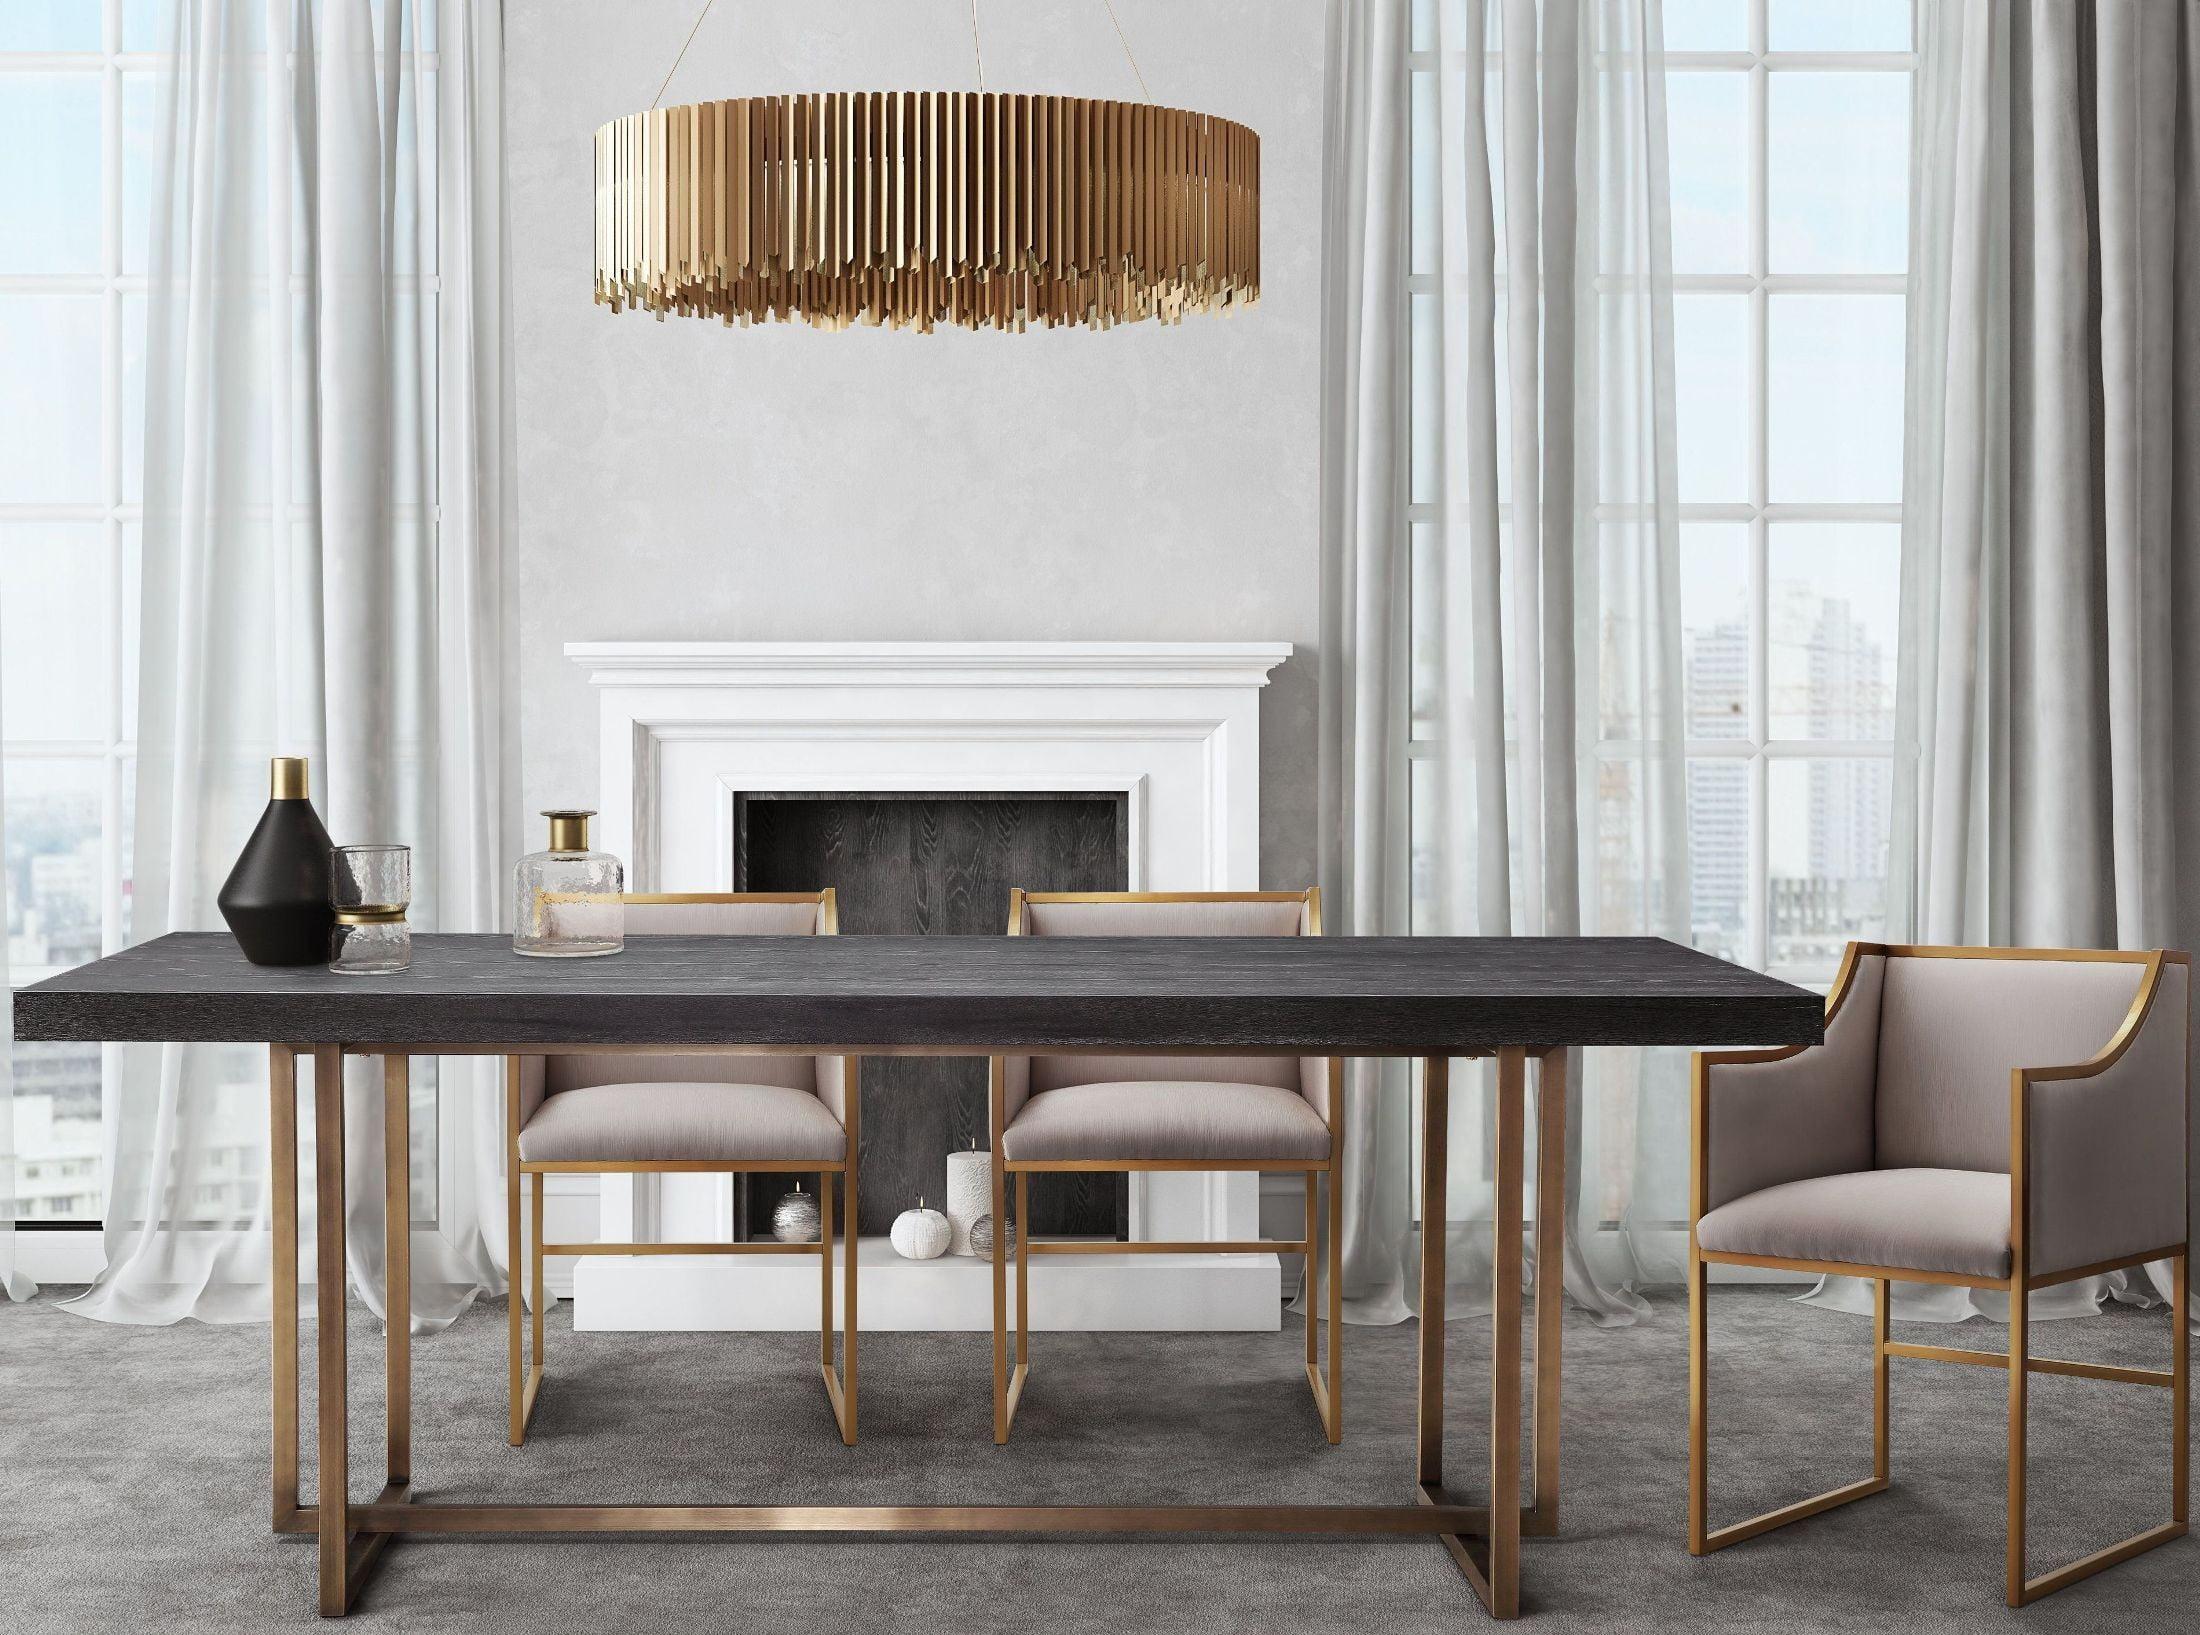 Atara Cream Velvet Gold Chair from TOV Furniture L6122